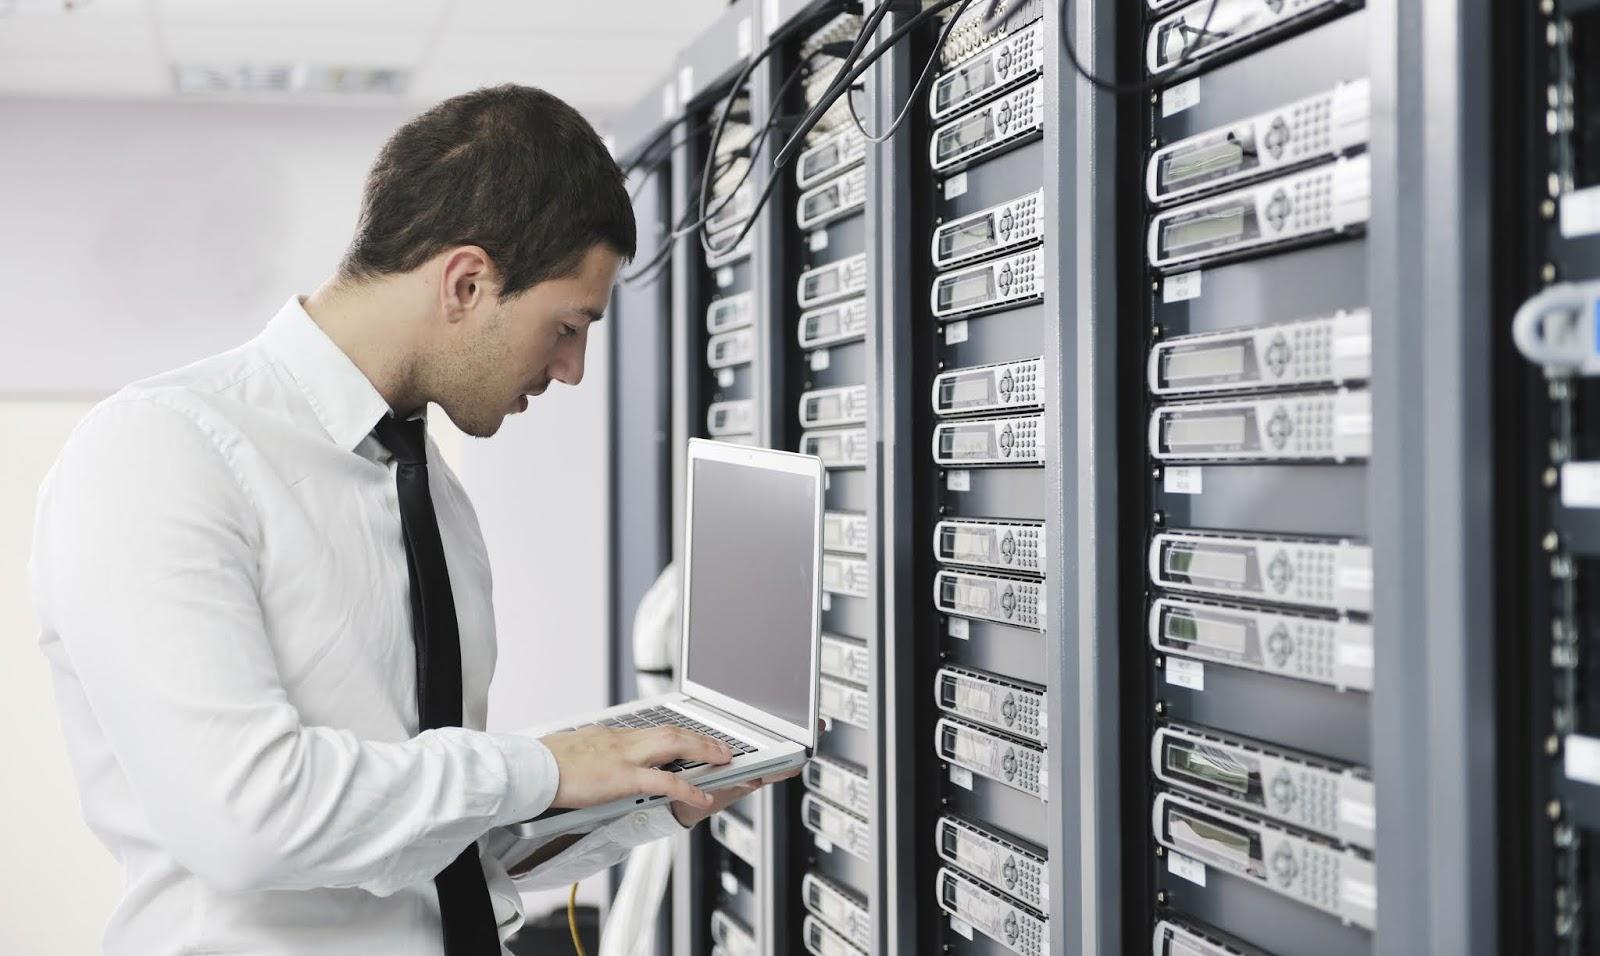 Control panel hosting